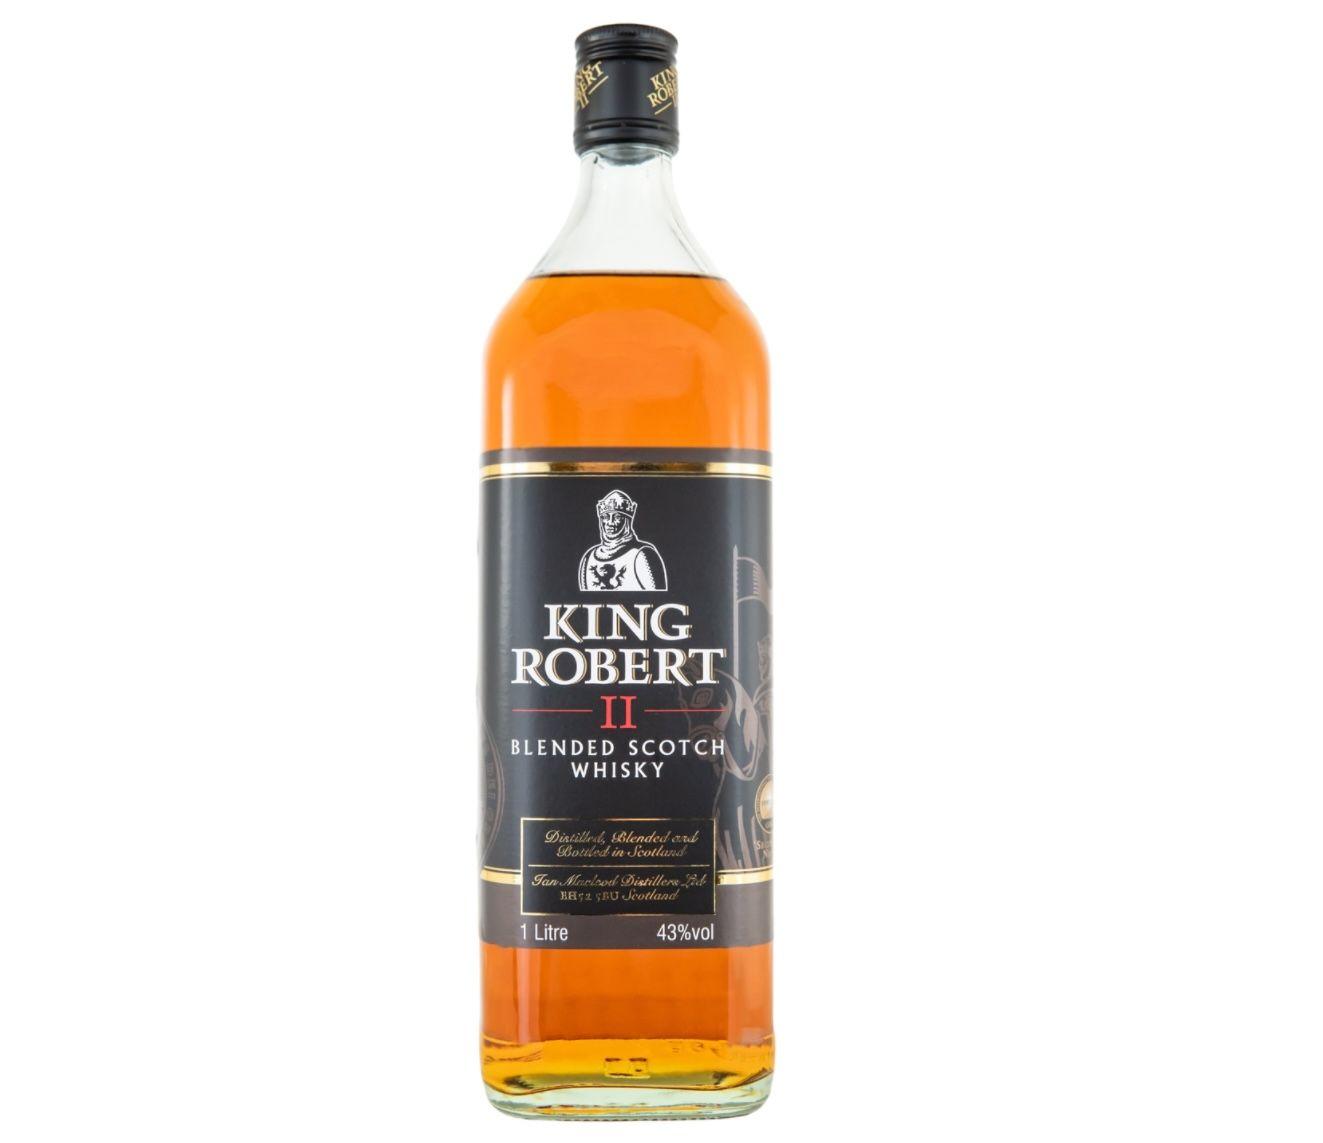 3x King Robert II Blended Scotch Whisky (je 1 Liter, 43% Vol.) für 34,50€(statt 46€)